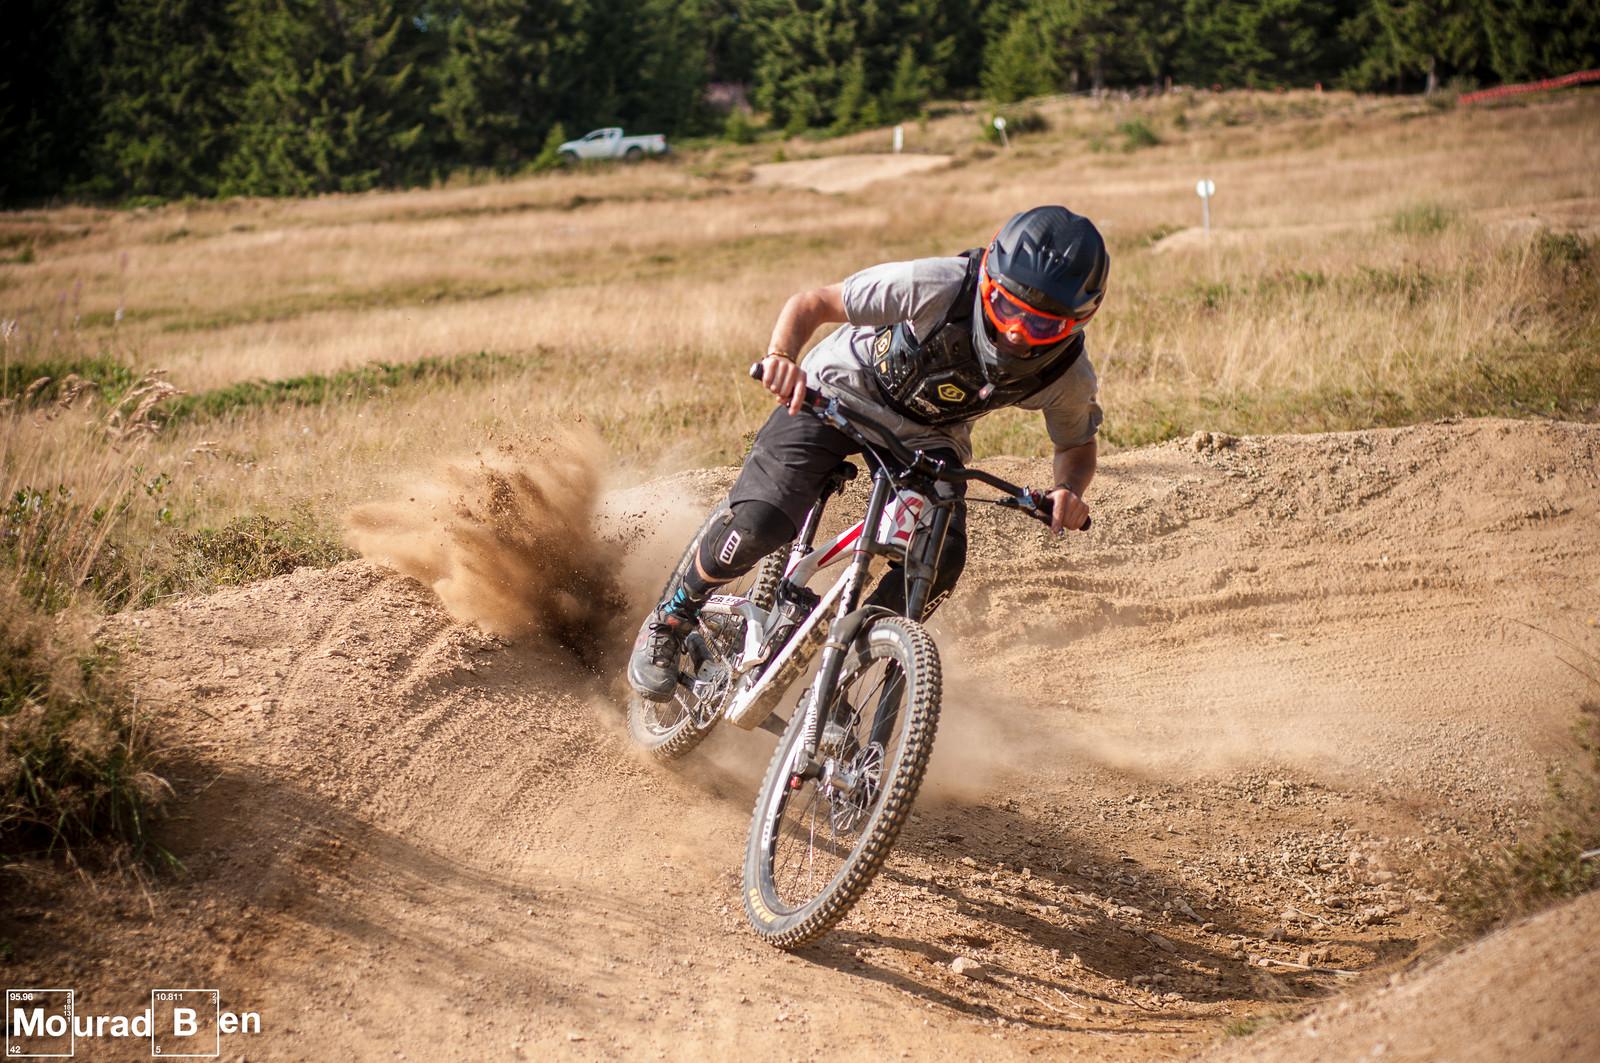 Broap - Romuald_Manach - Mountain Biking Pictures - Vital MTB